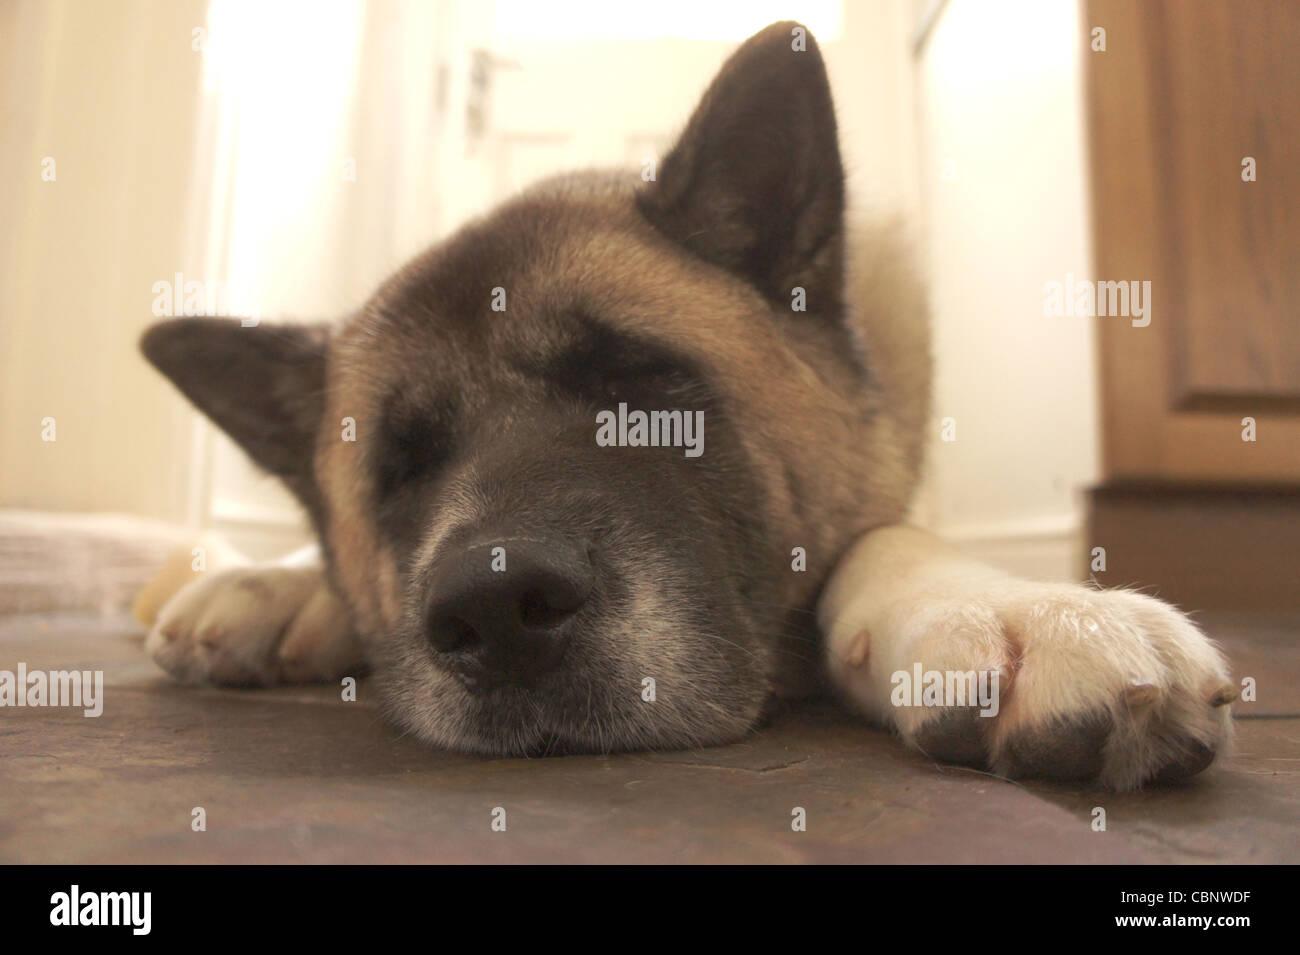 SONY DSC , Japanese Akita dog asleep, - Stock Image